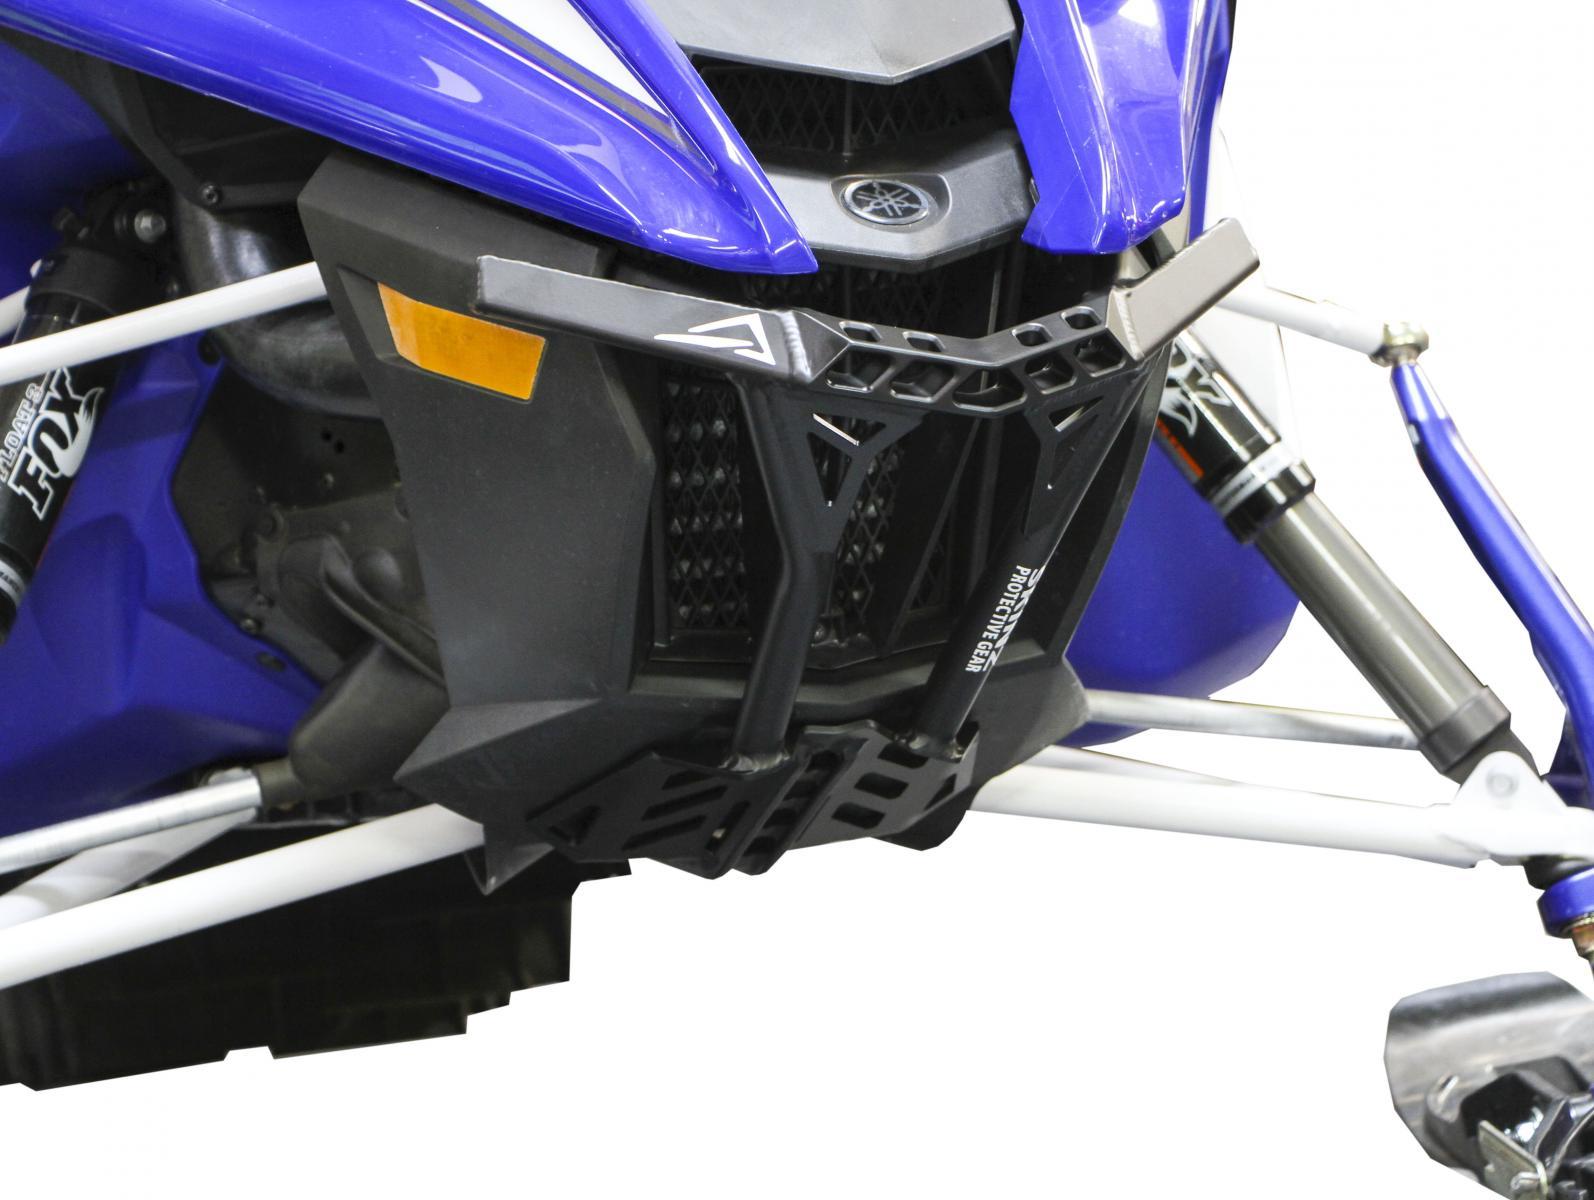 Click image for larger version  Name:SPG Yamaha Sidewinder Front Bumper inst #YFB700-FBK.jpg Views:46 Size:149.6 KB ID:2032562